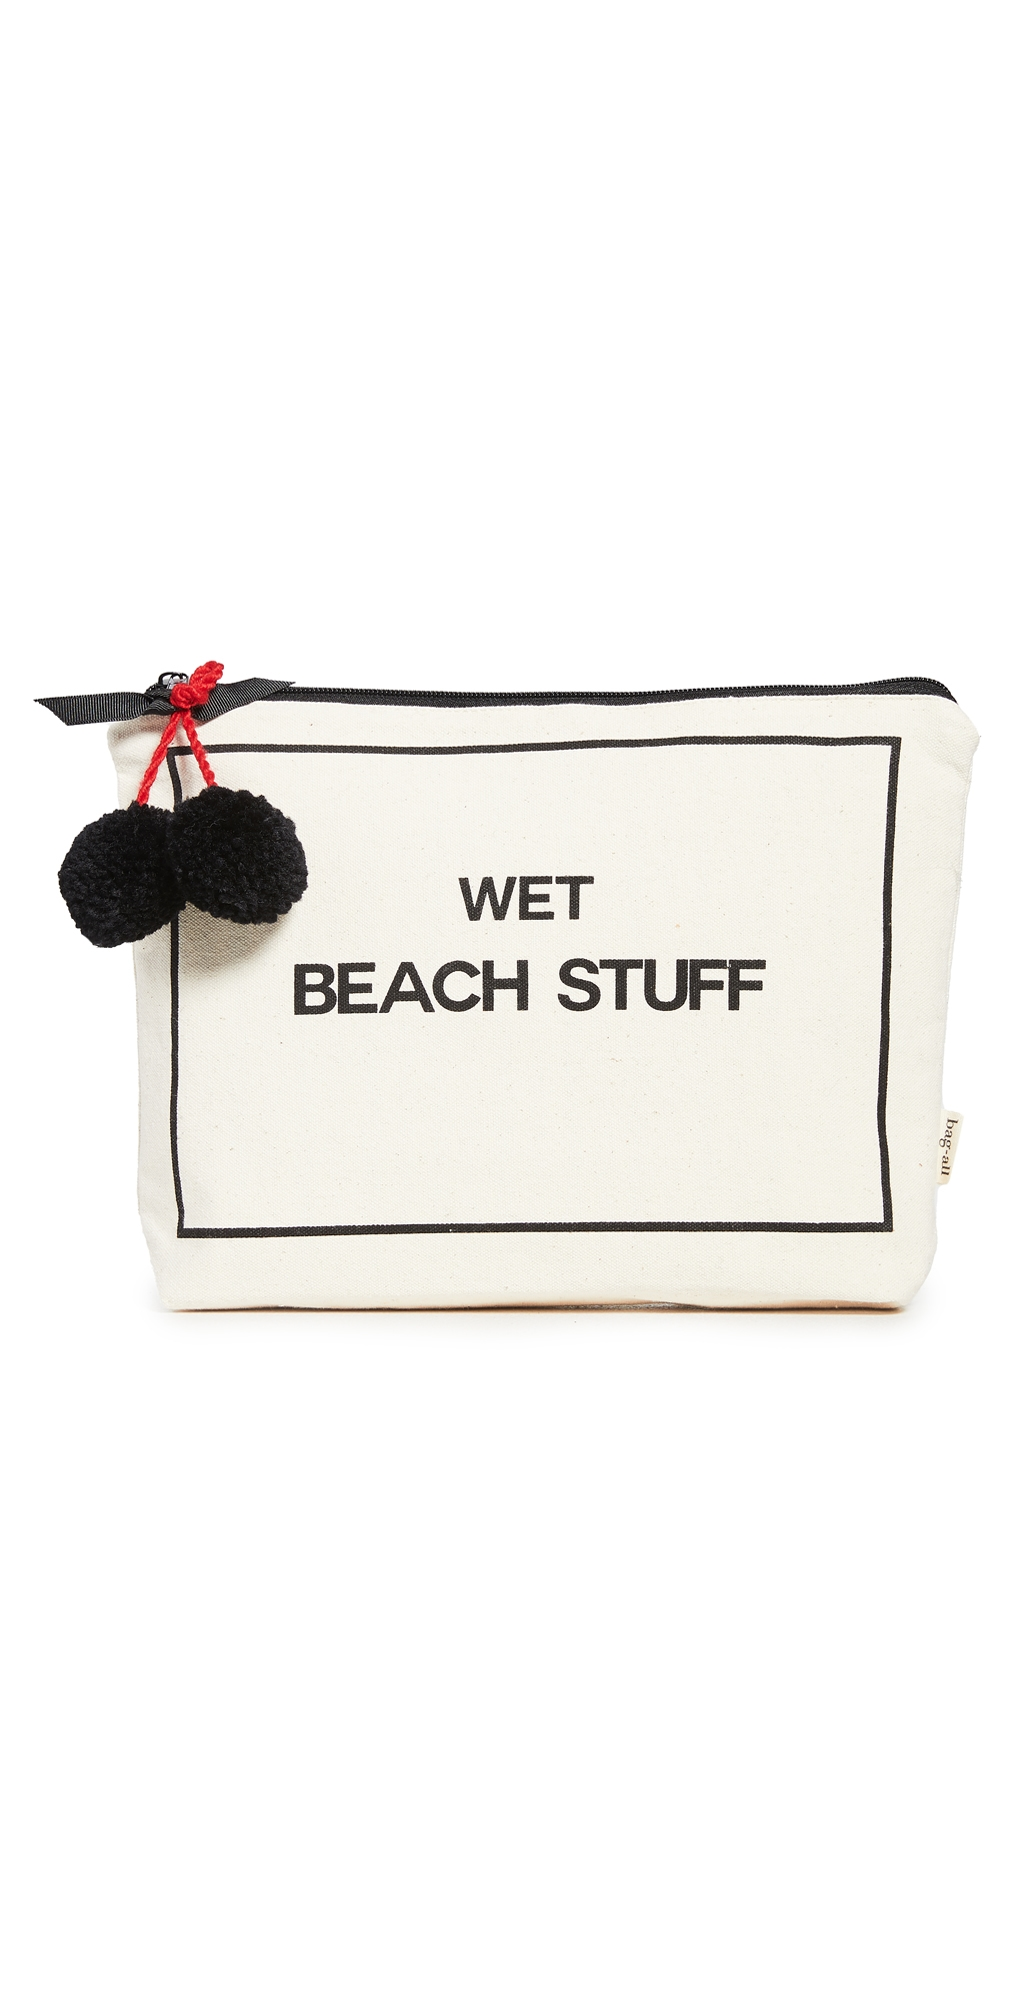 Wet Stuff Bag